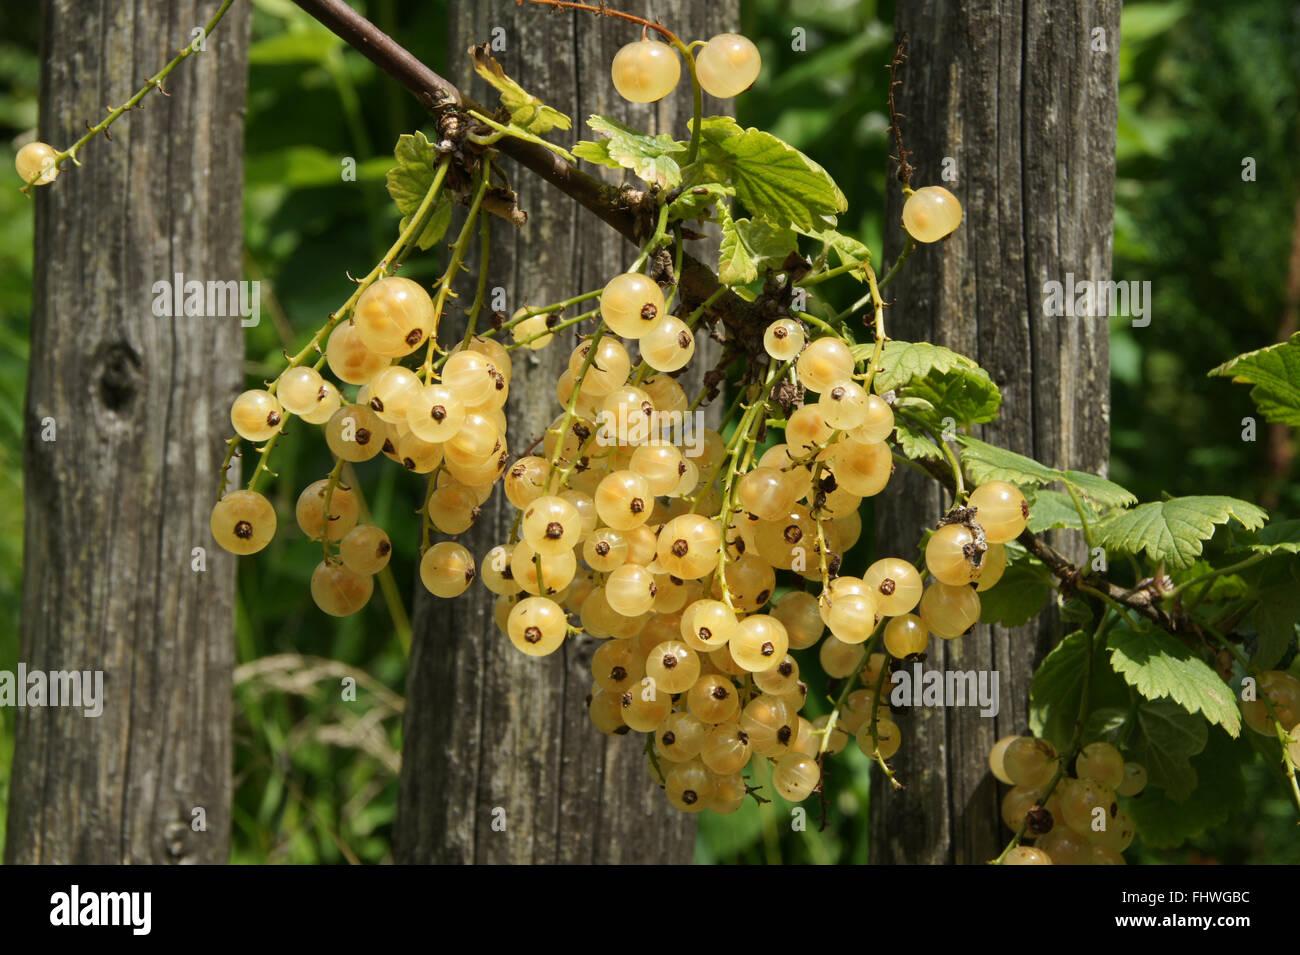 Ribes rubrum Blanka, White currant Stock Photo